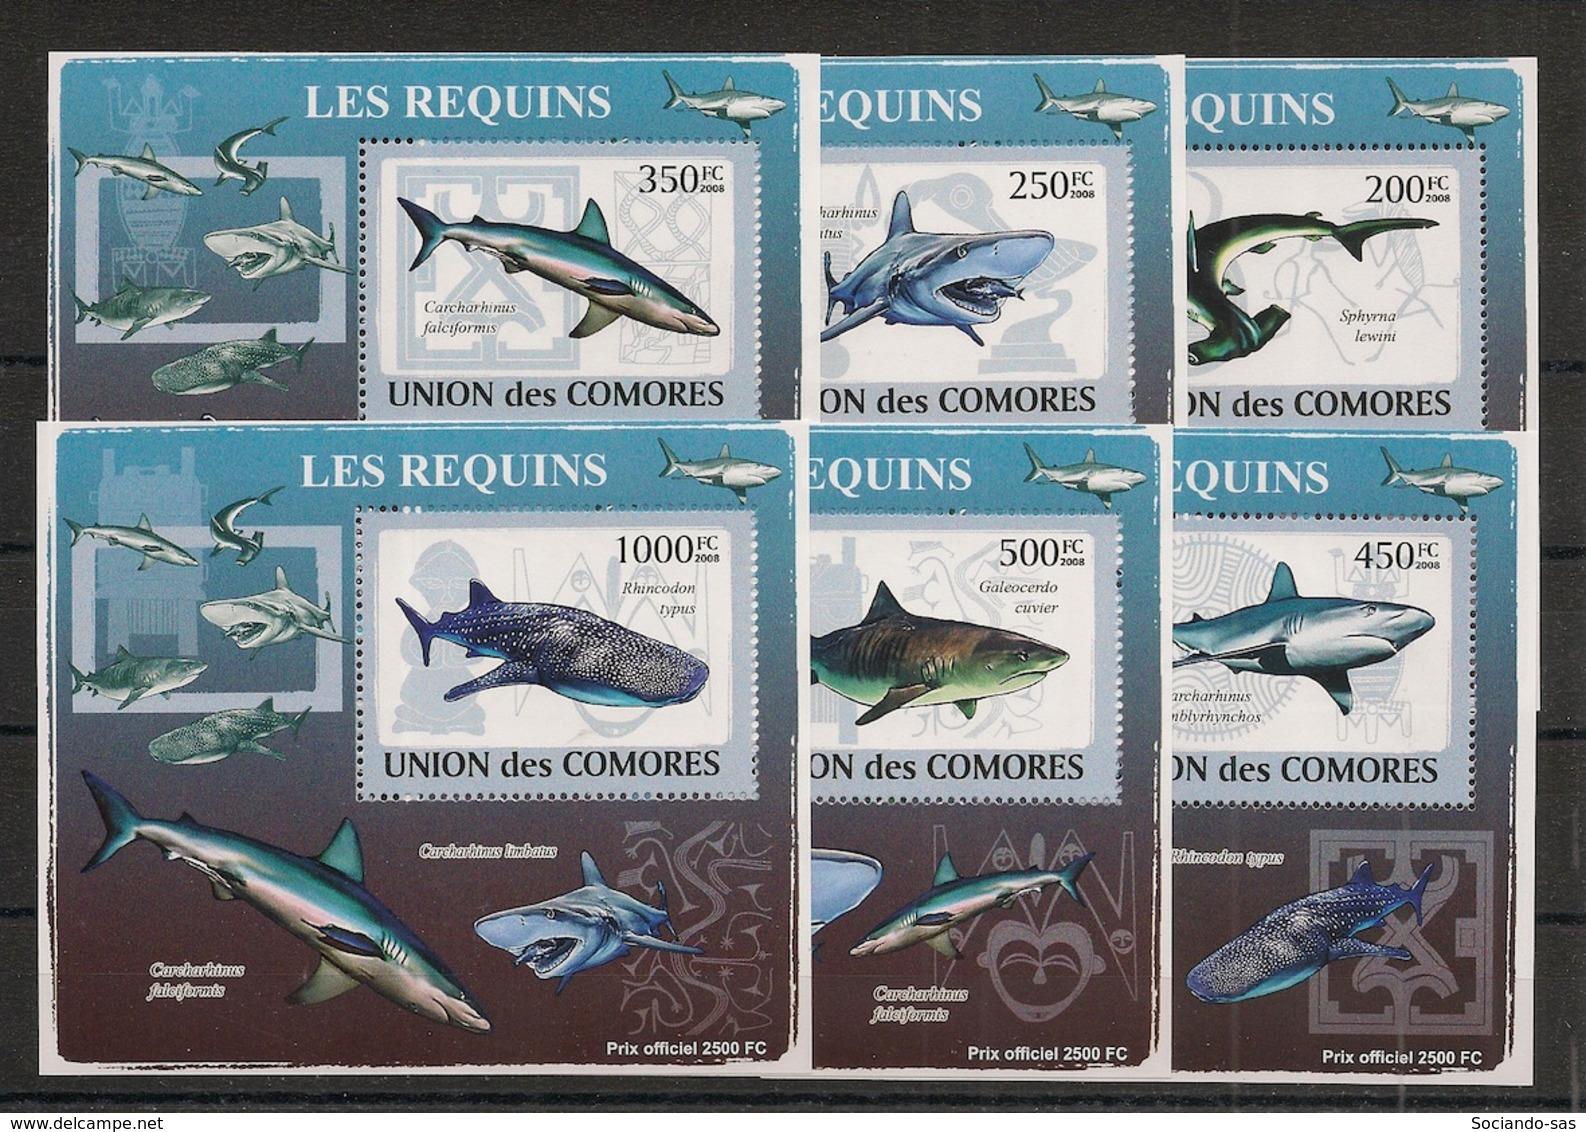 Comores - 2009 - KLB N°Yv. 1483 à 1488 - Requins - Neuf Luxe ** / MNH / Postfrisch - Mammifères Marins